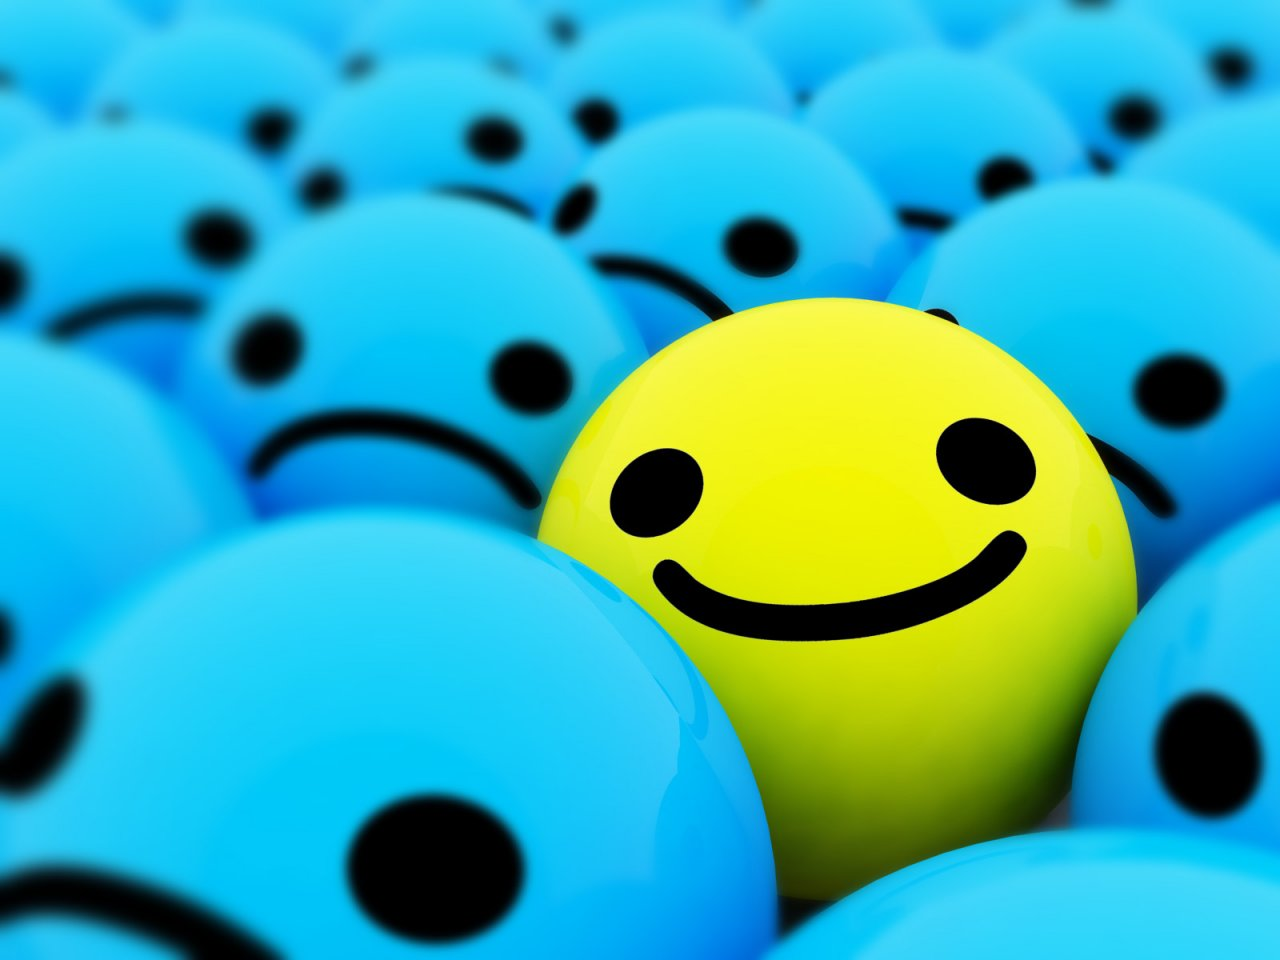 Smile You Are So Beautiful Attitude